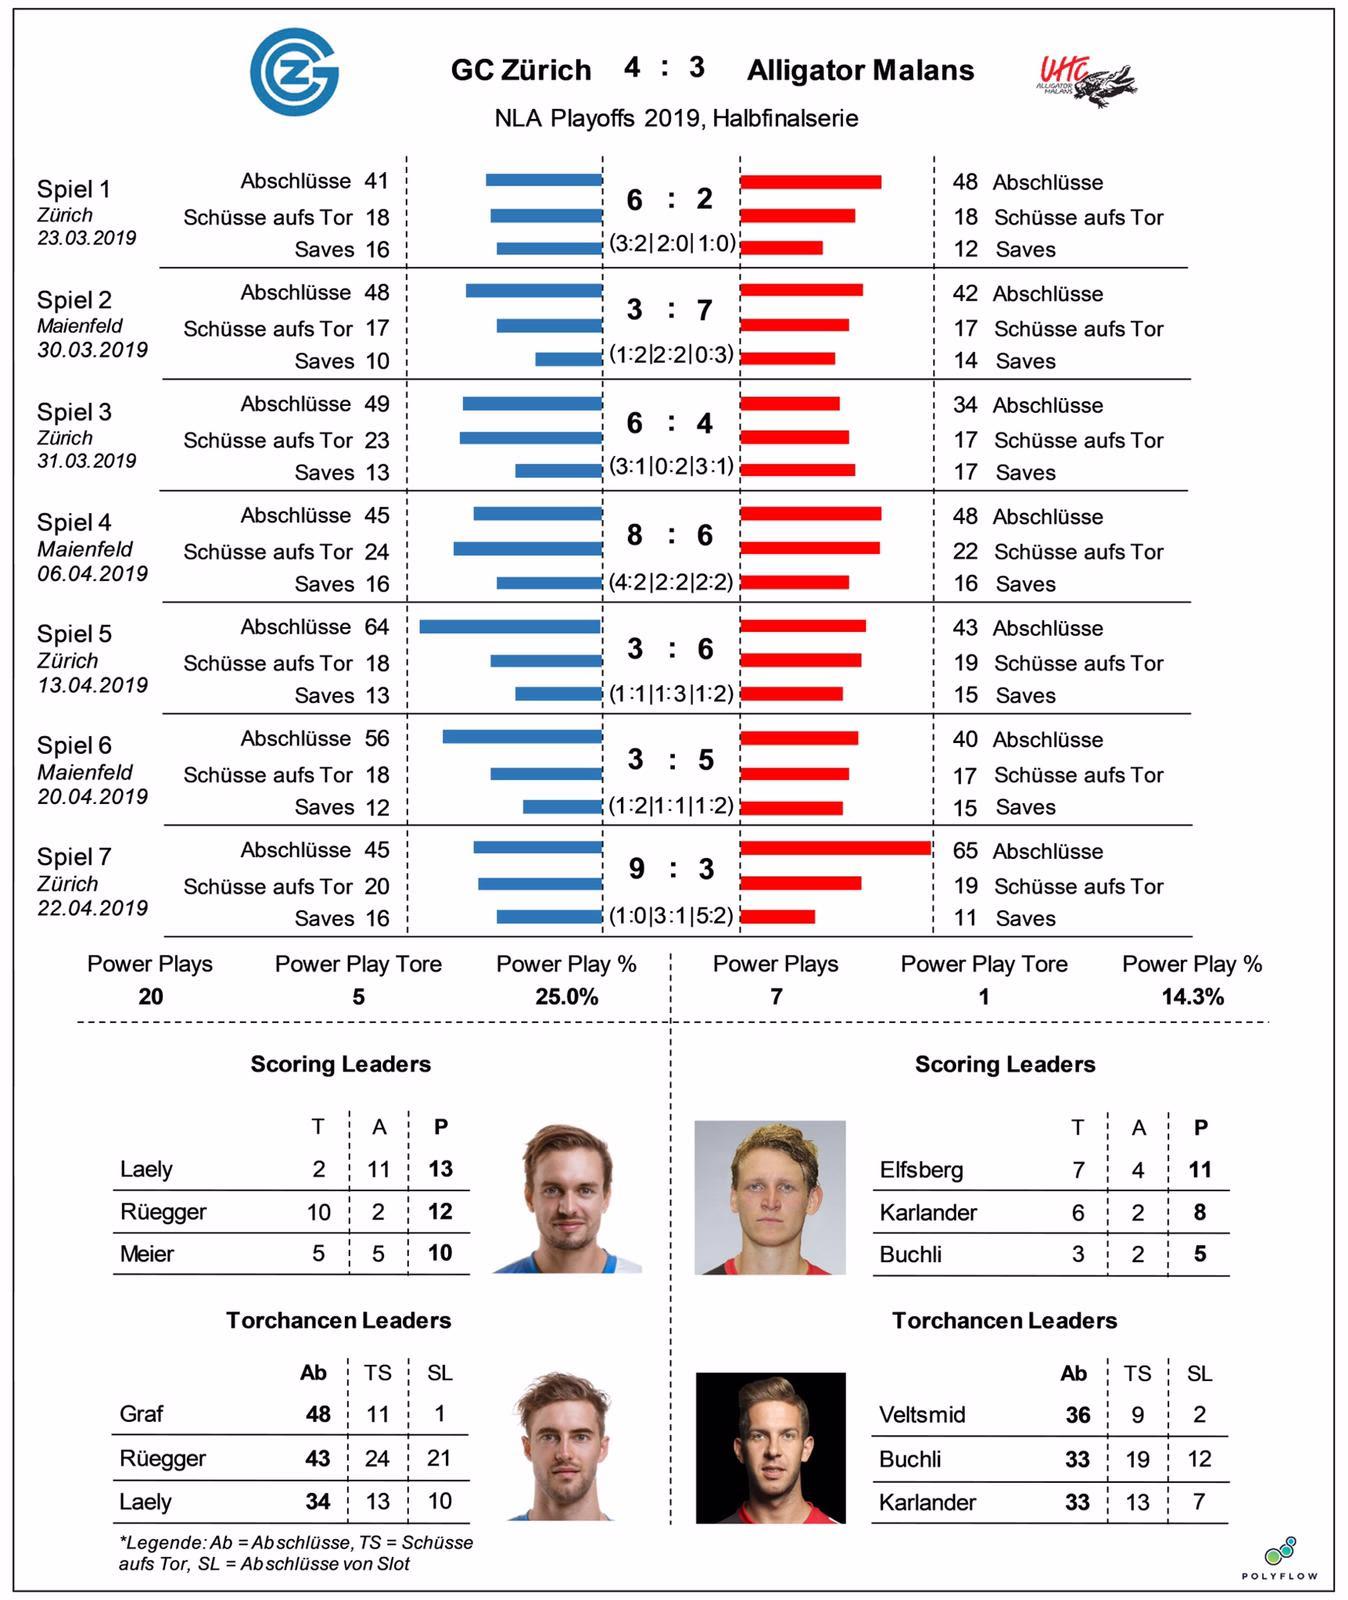 Statistik-Halbfinal.jpg